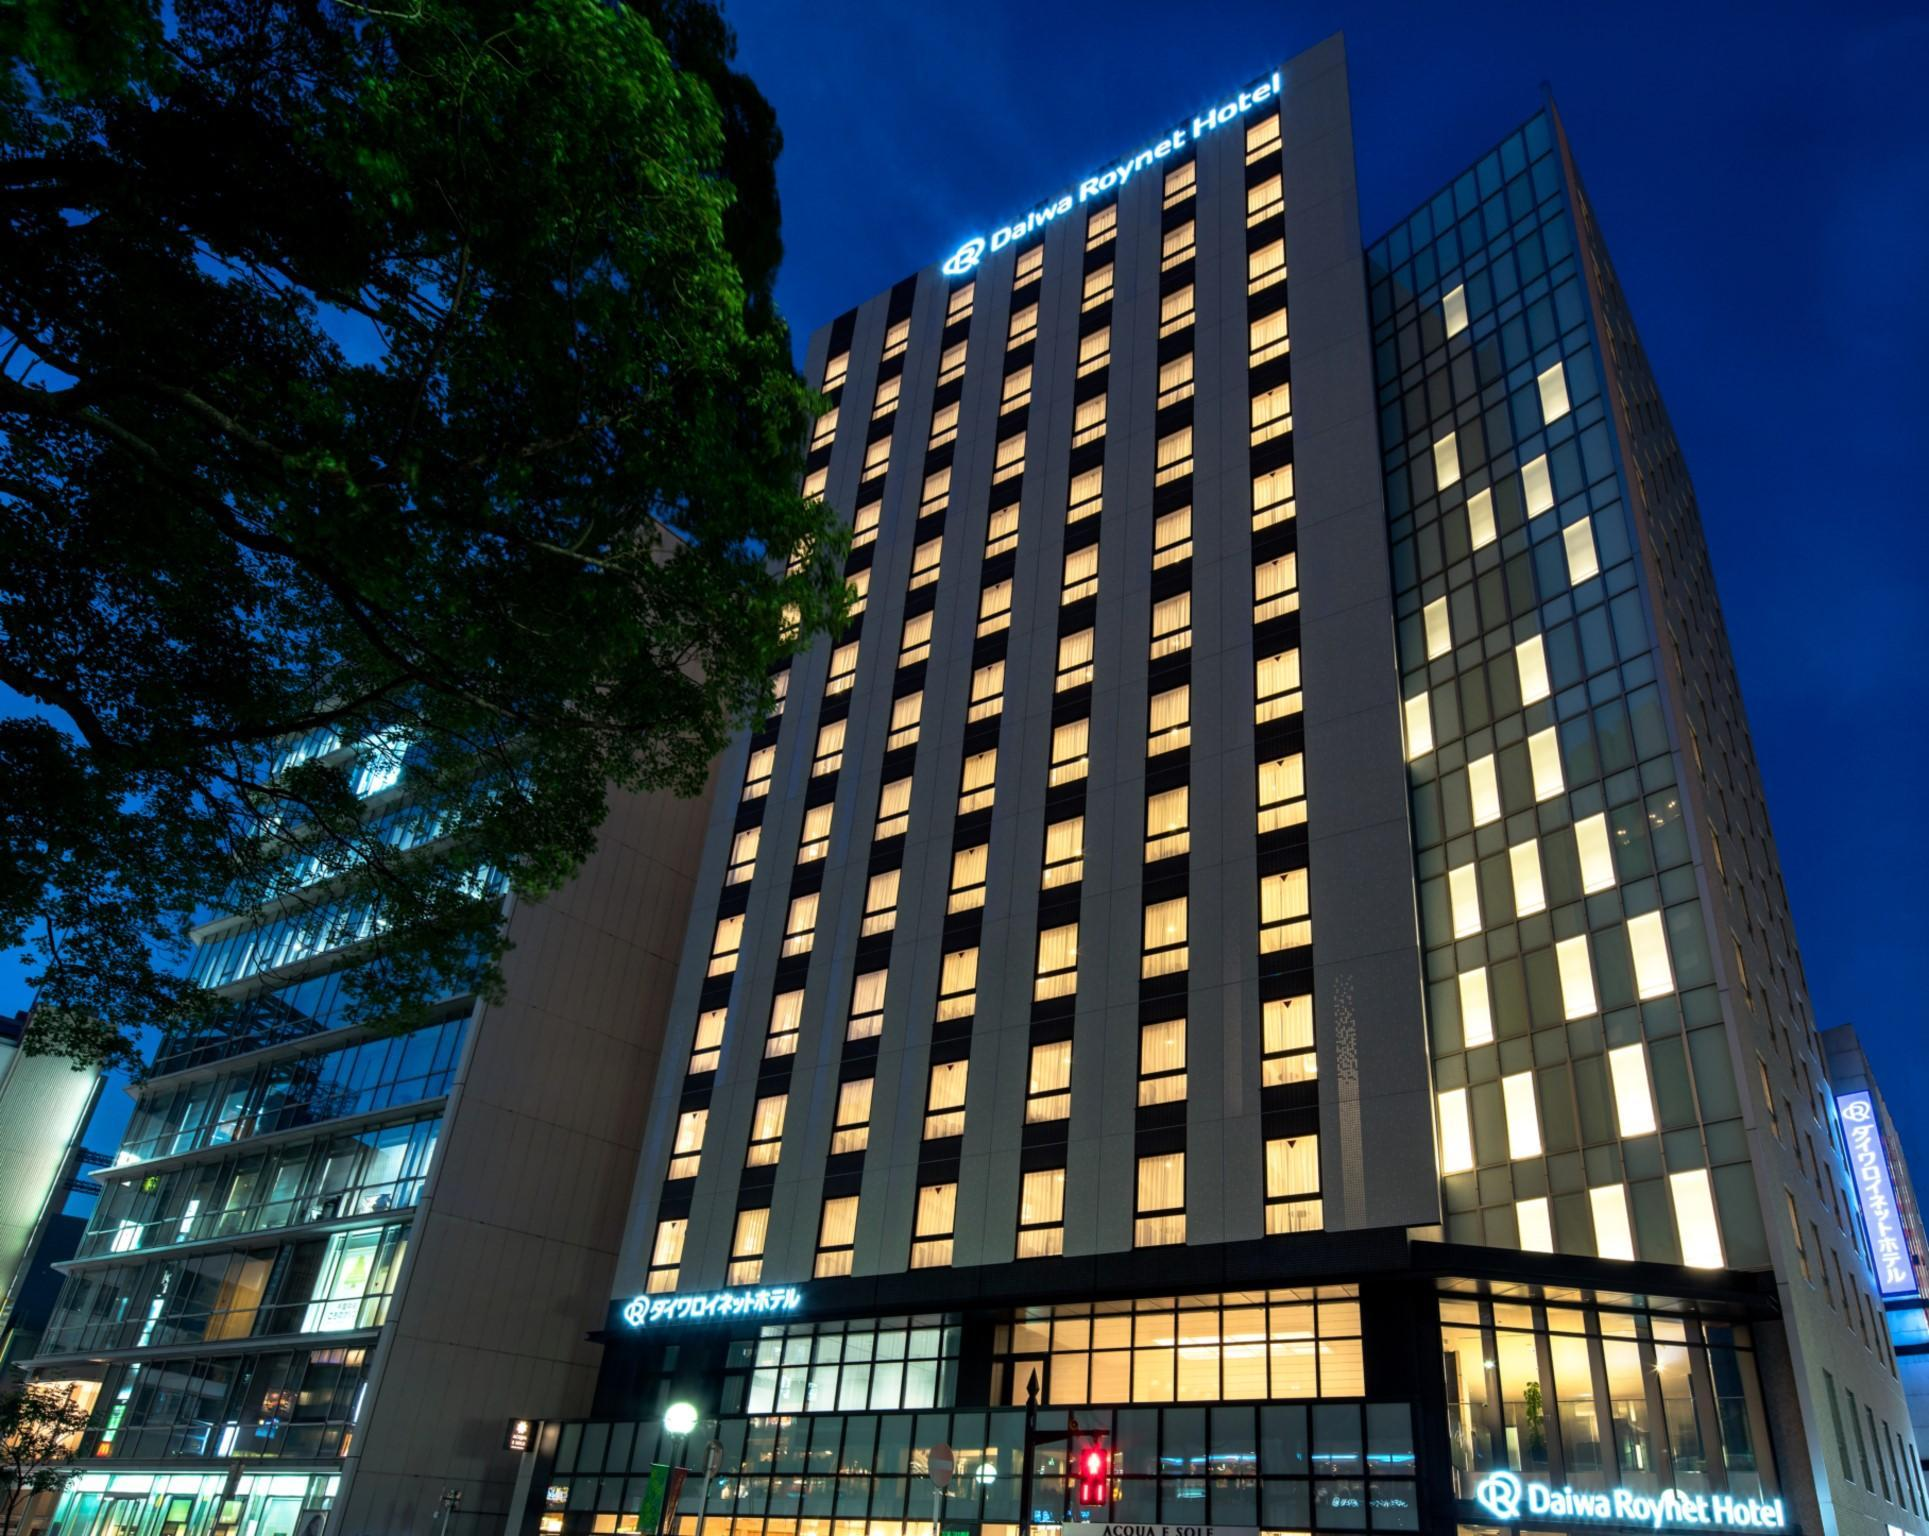 Daiwa Roynet Hotel Chiba Chuo